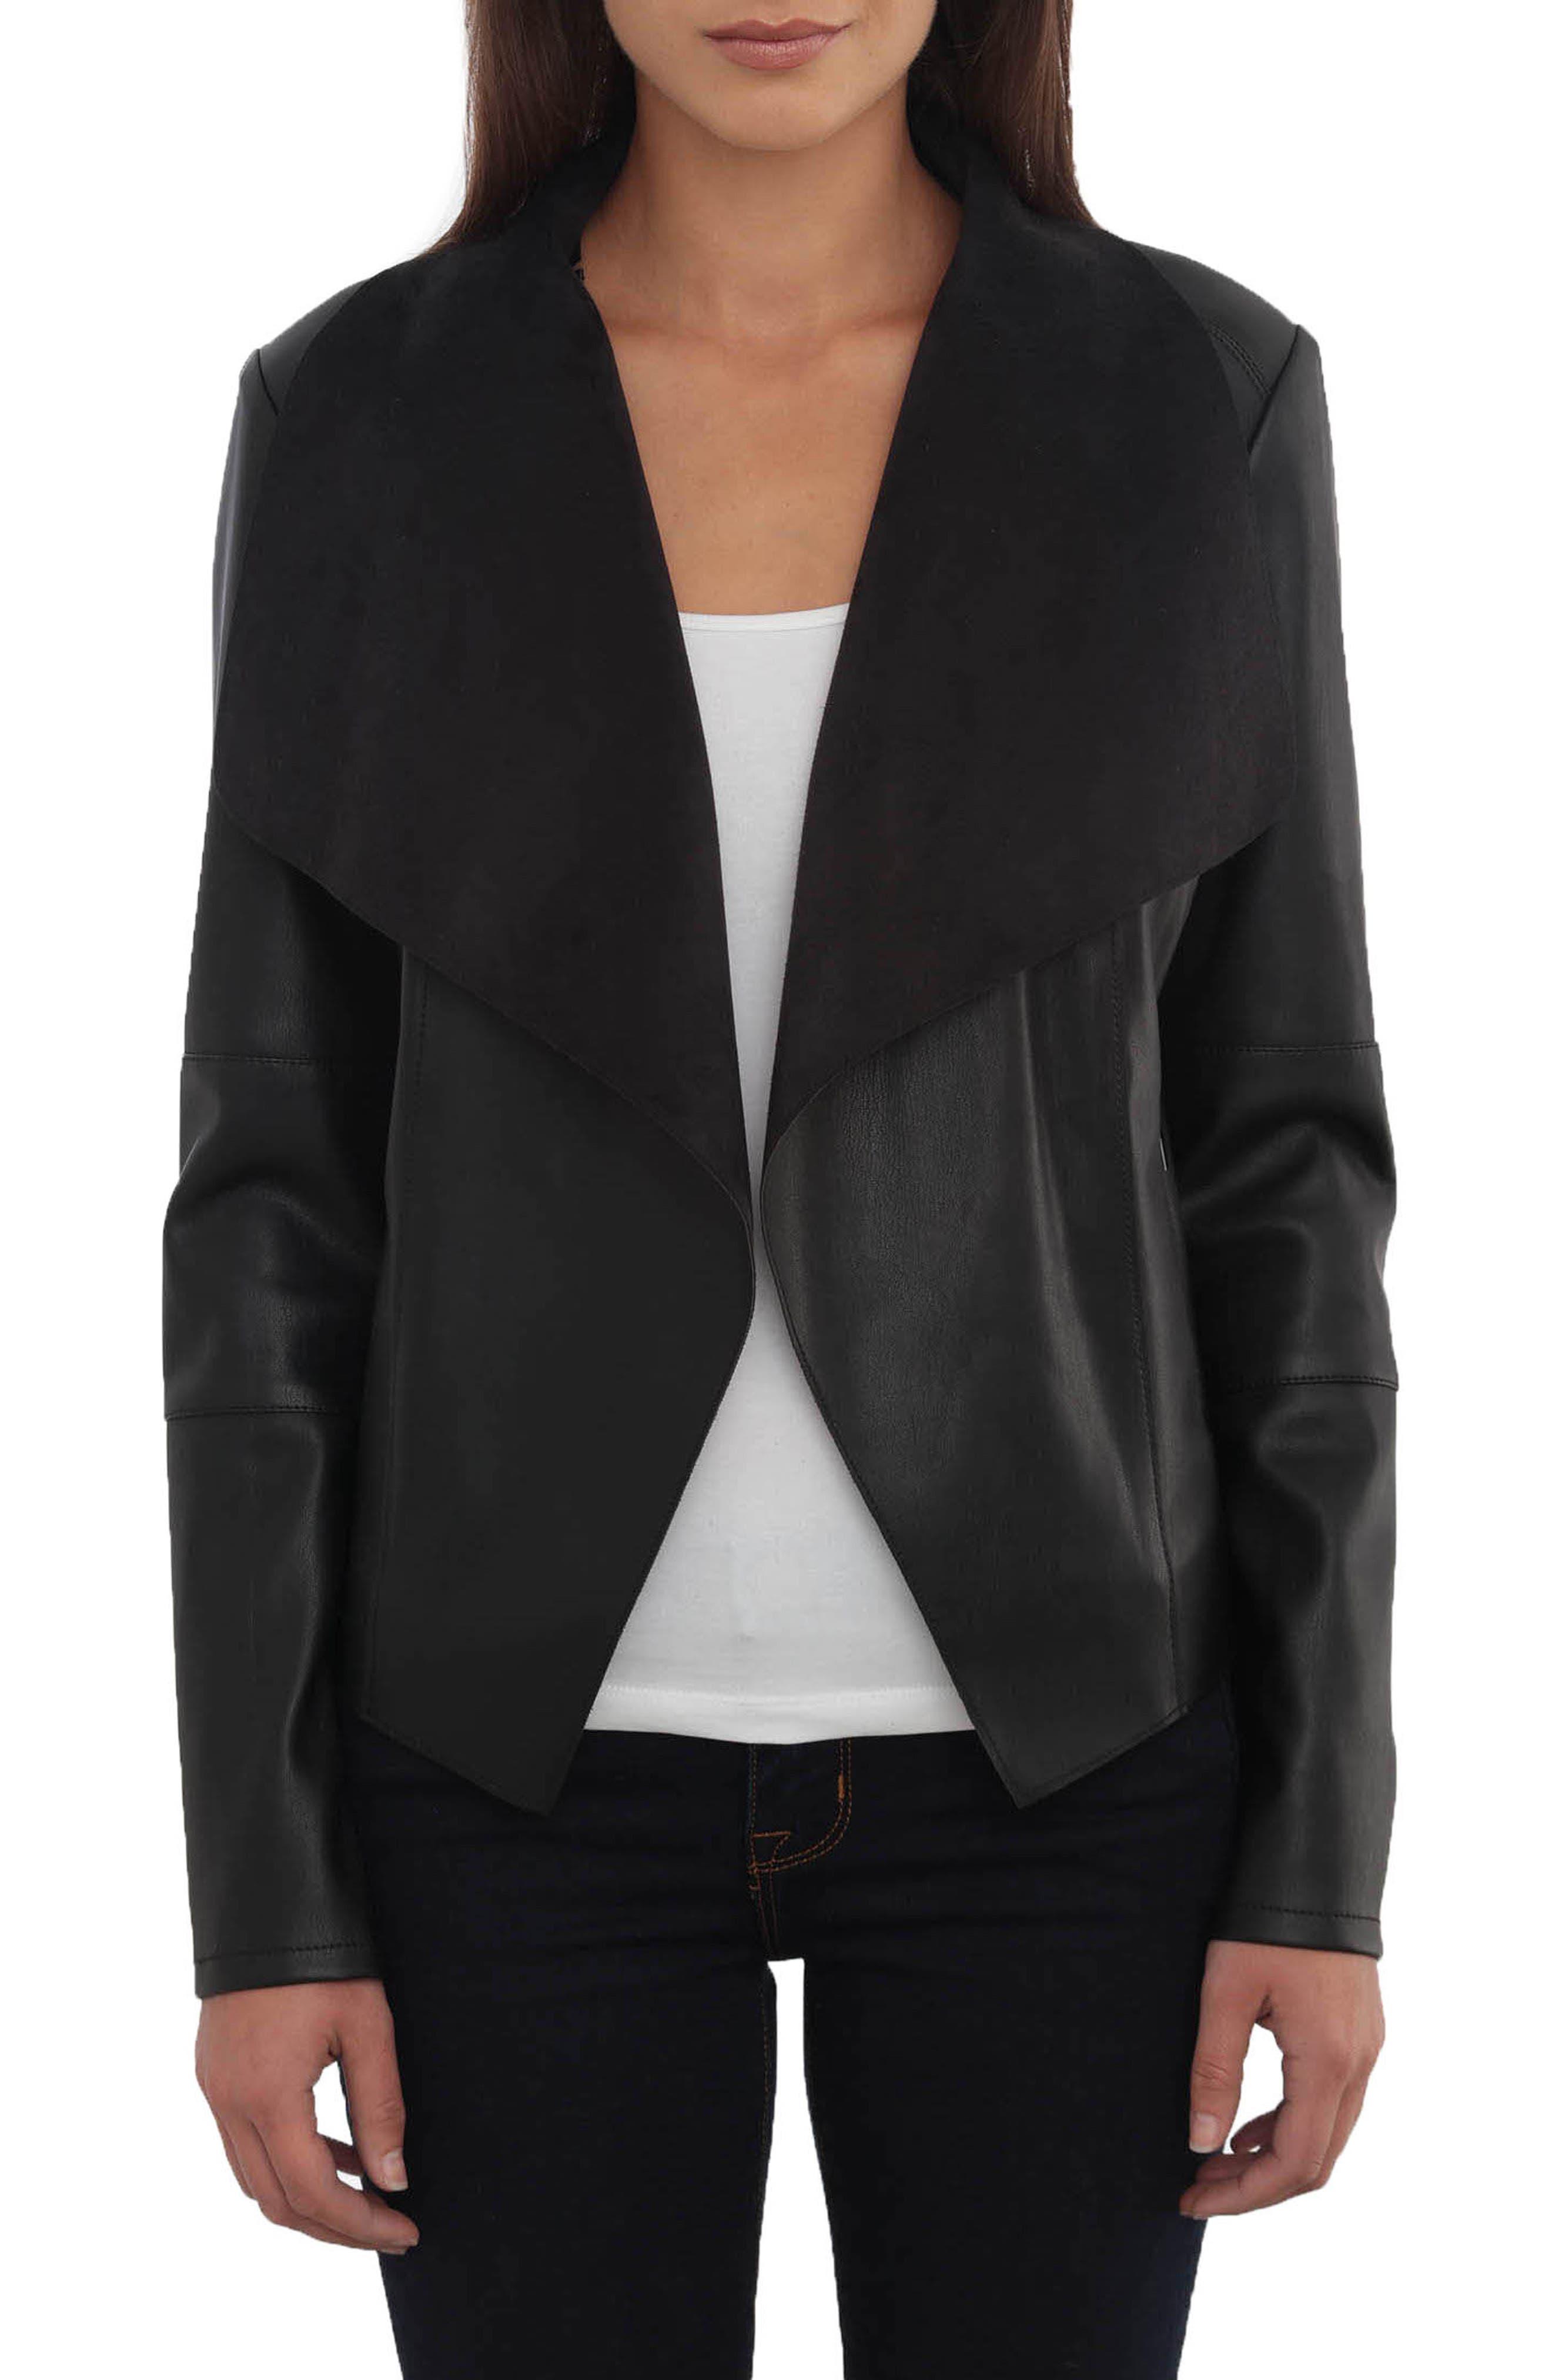 Image of Bagatelle Drape Faux Leather & Faux Suede Jacket